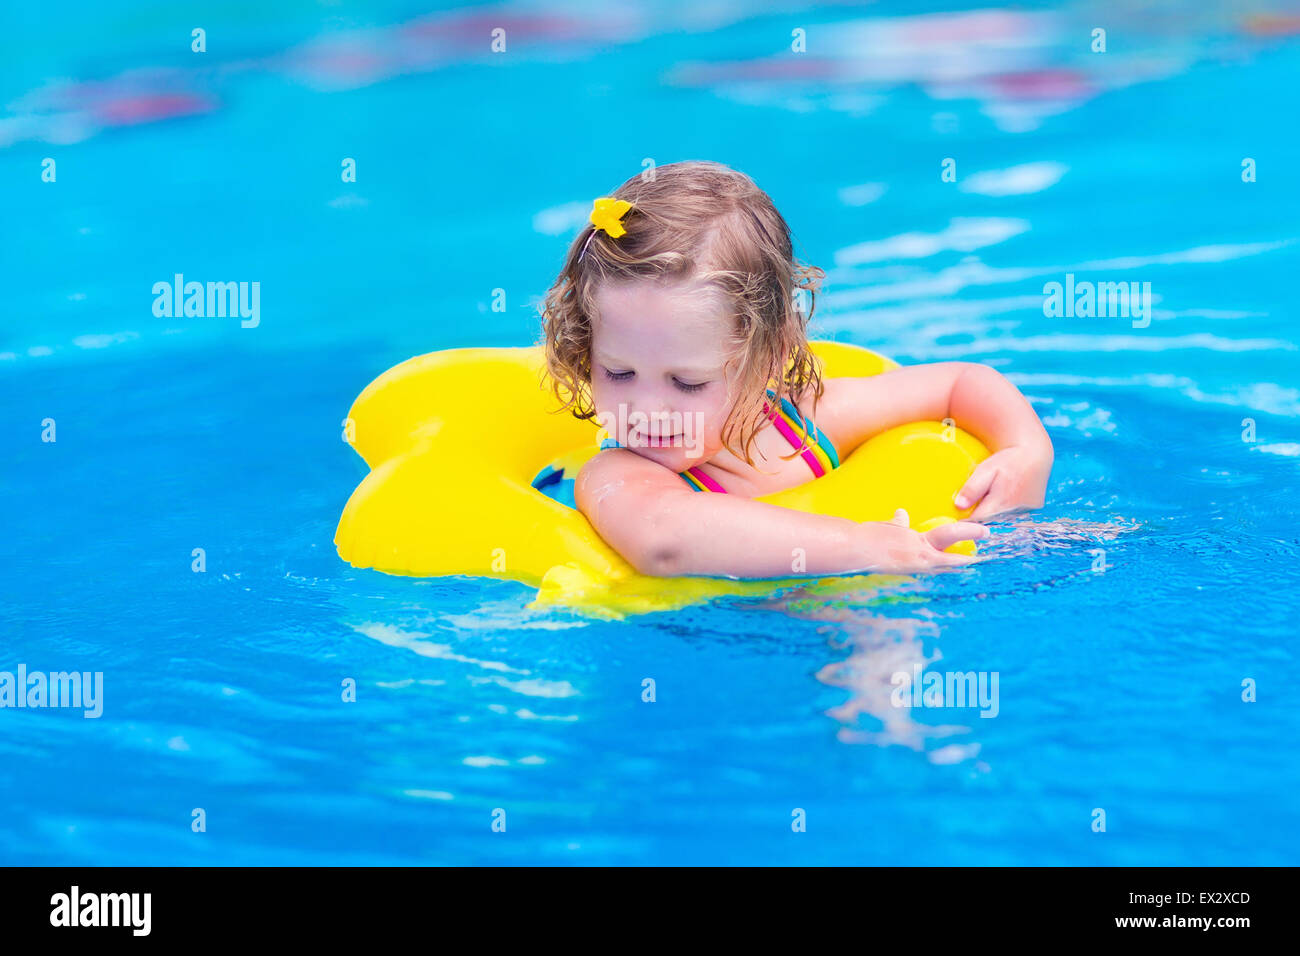 Kids In Swimming Pool Children Swim Outdoors Toddler Child During Stock Photo Royalty Free